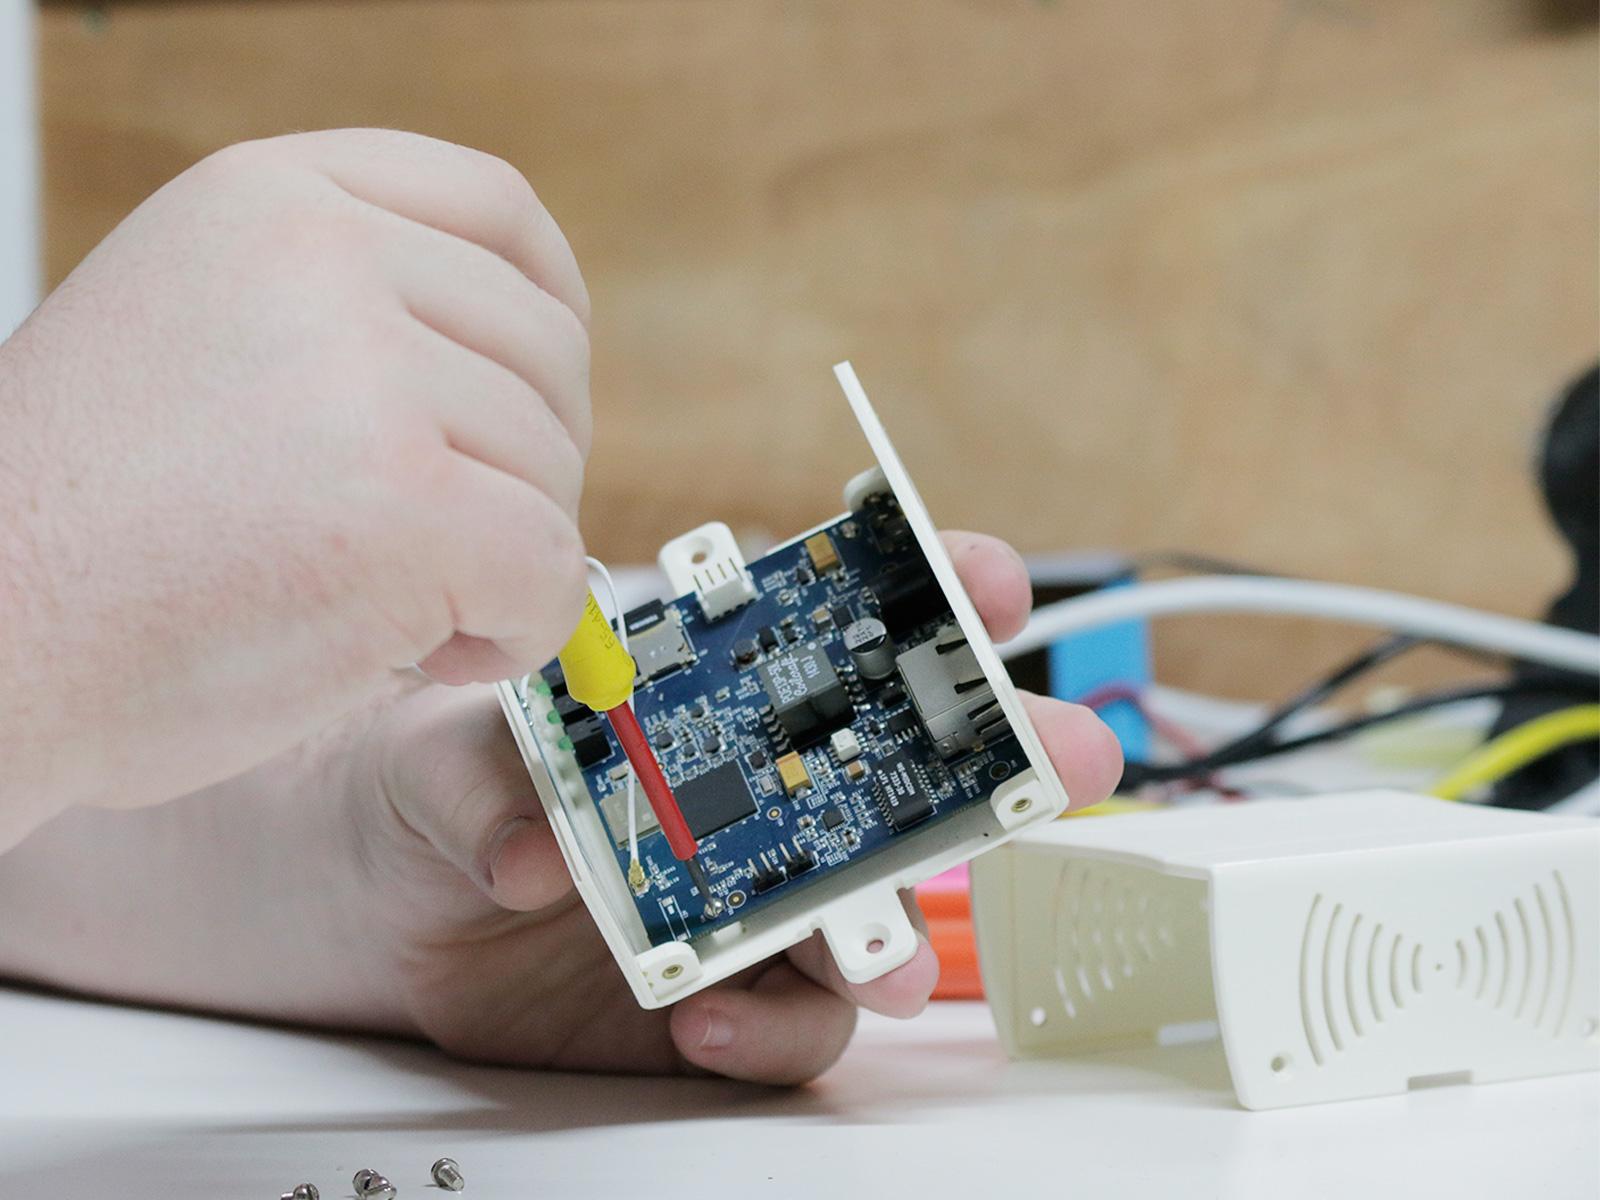 Using sensor technology to improve city congestion